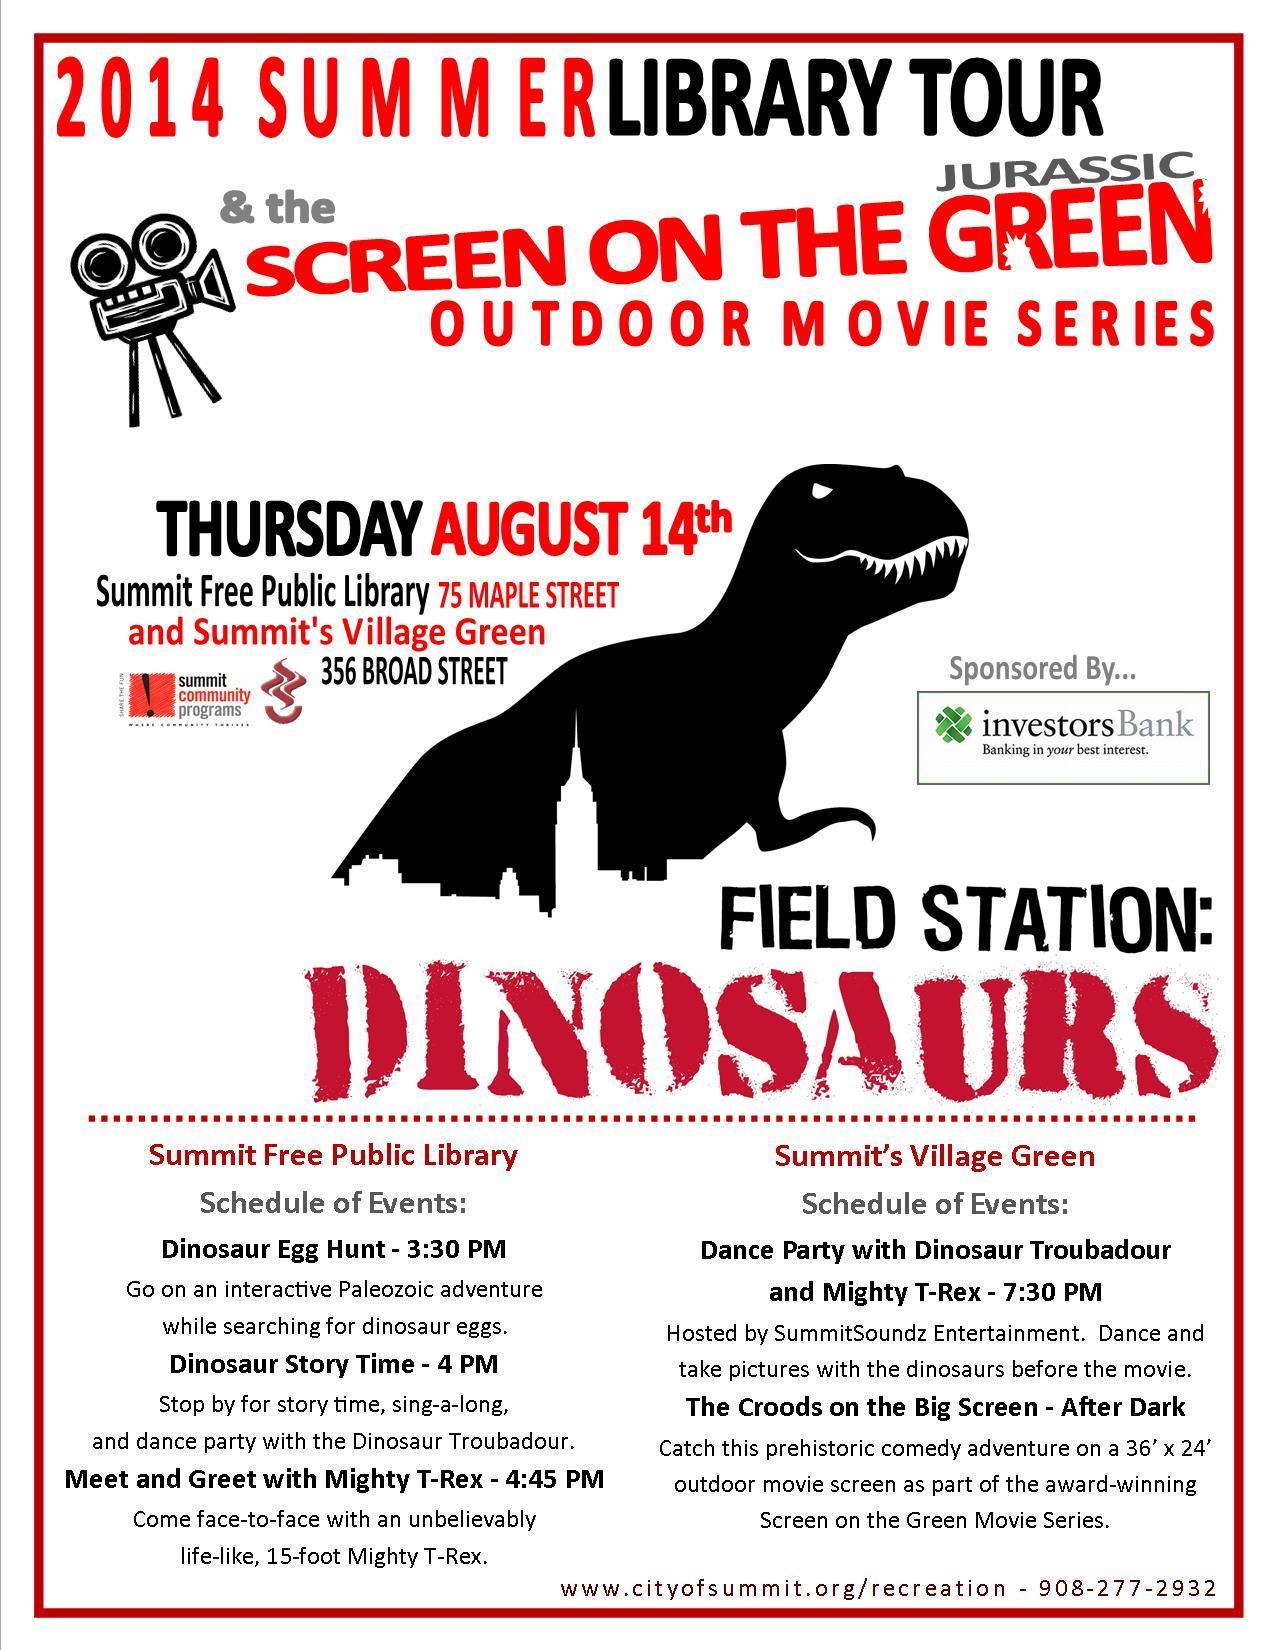 d83c0e59a8d079c3ca2f_Field_Station_Dinosaur_Summer_Library_Tour_and_Jurassic_Green.jpg